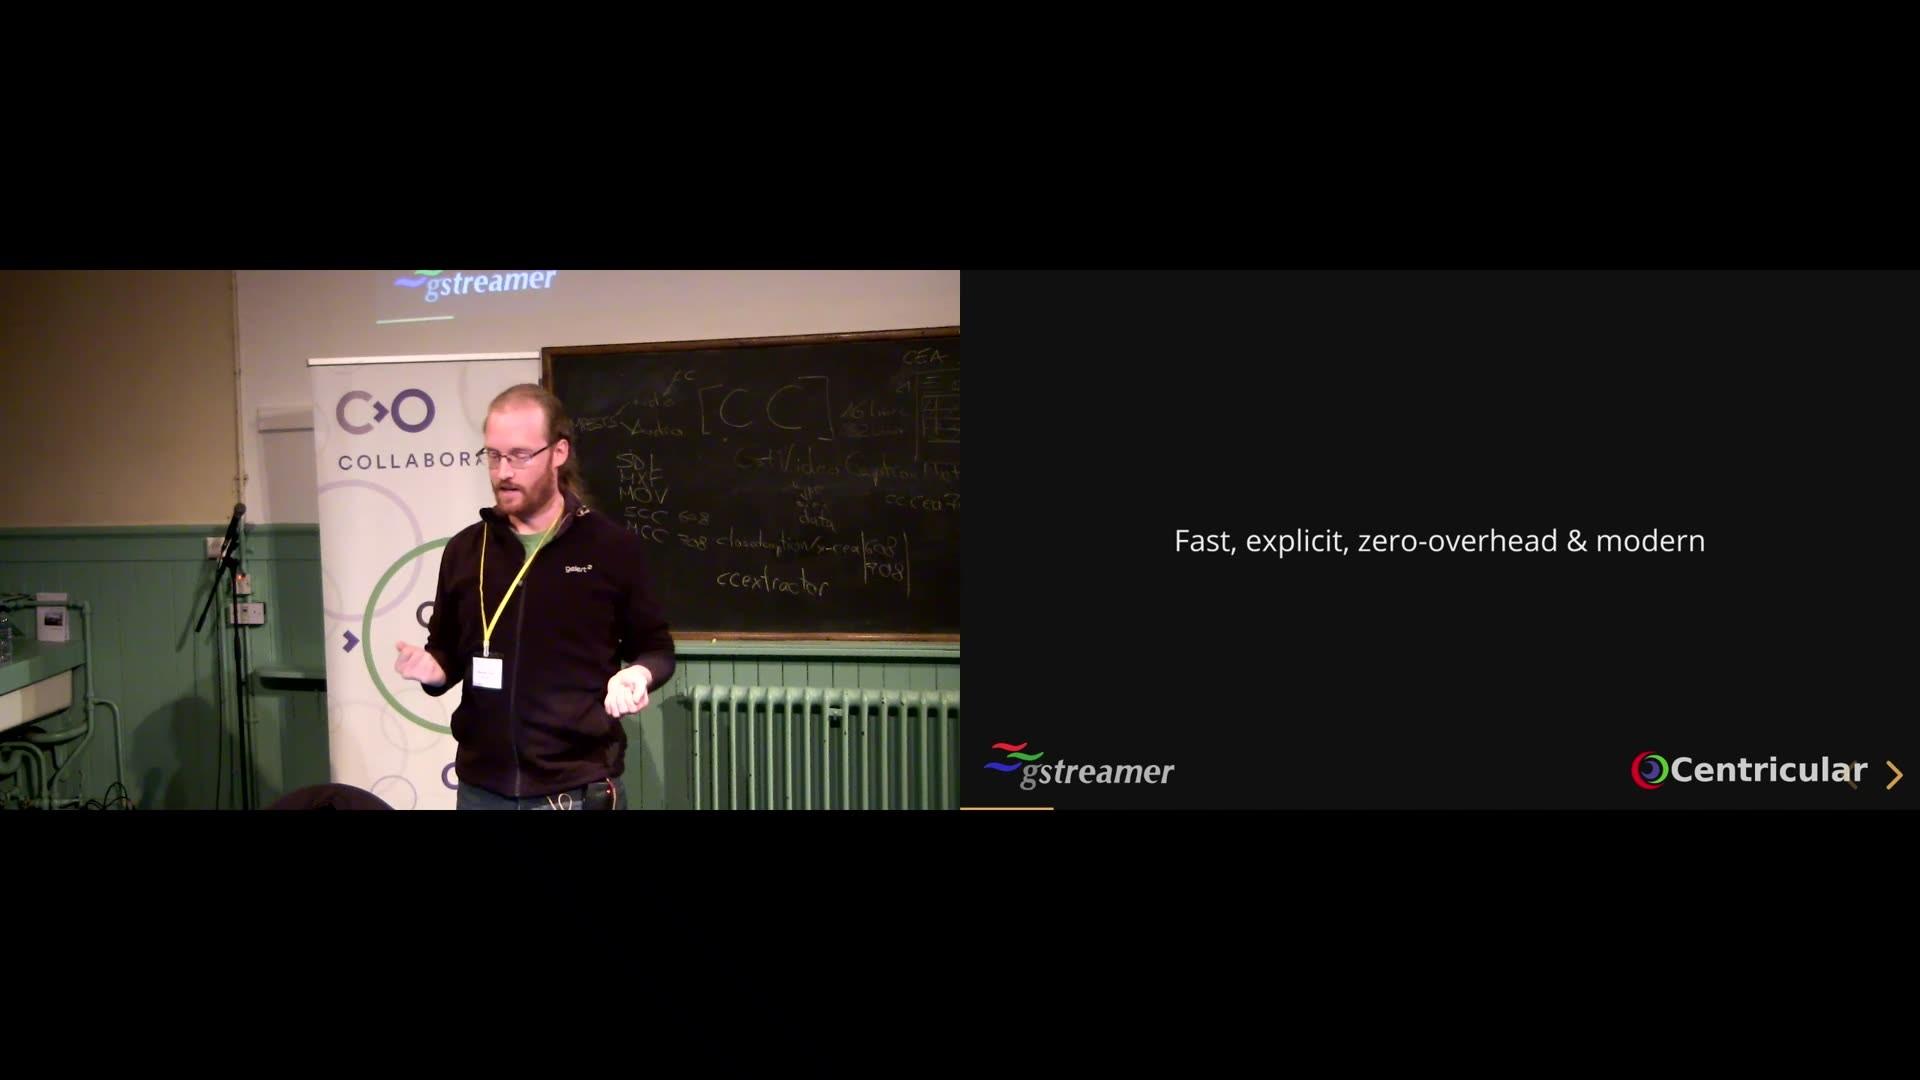 Experiences with gstreamer/webrtc